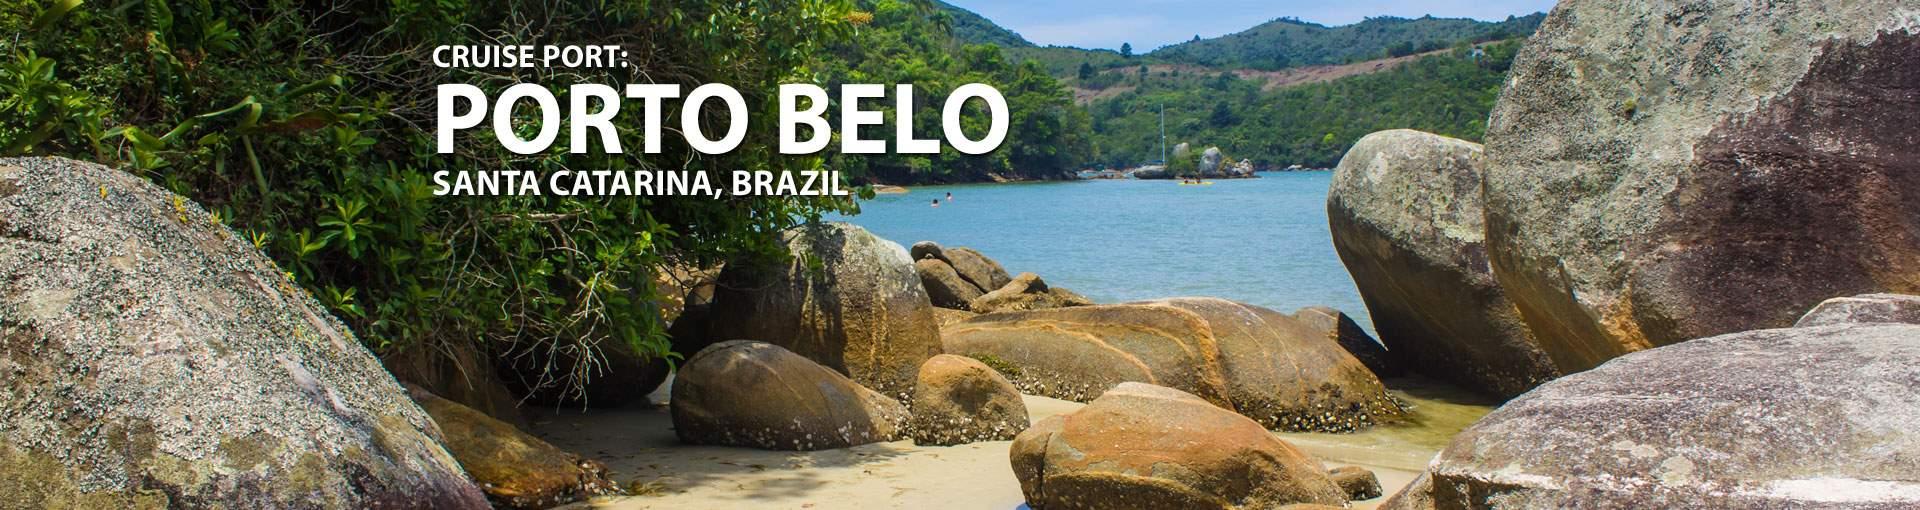 Cruises to Porto Belo (Santa Catarina), Brazil